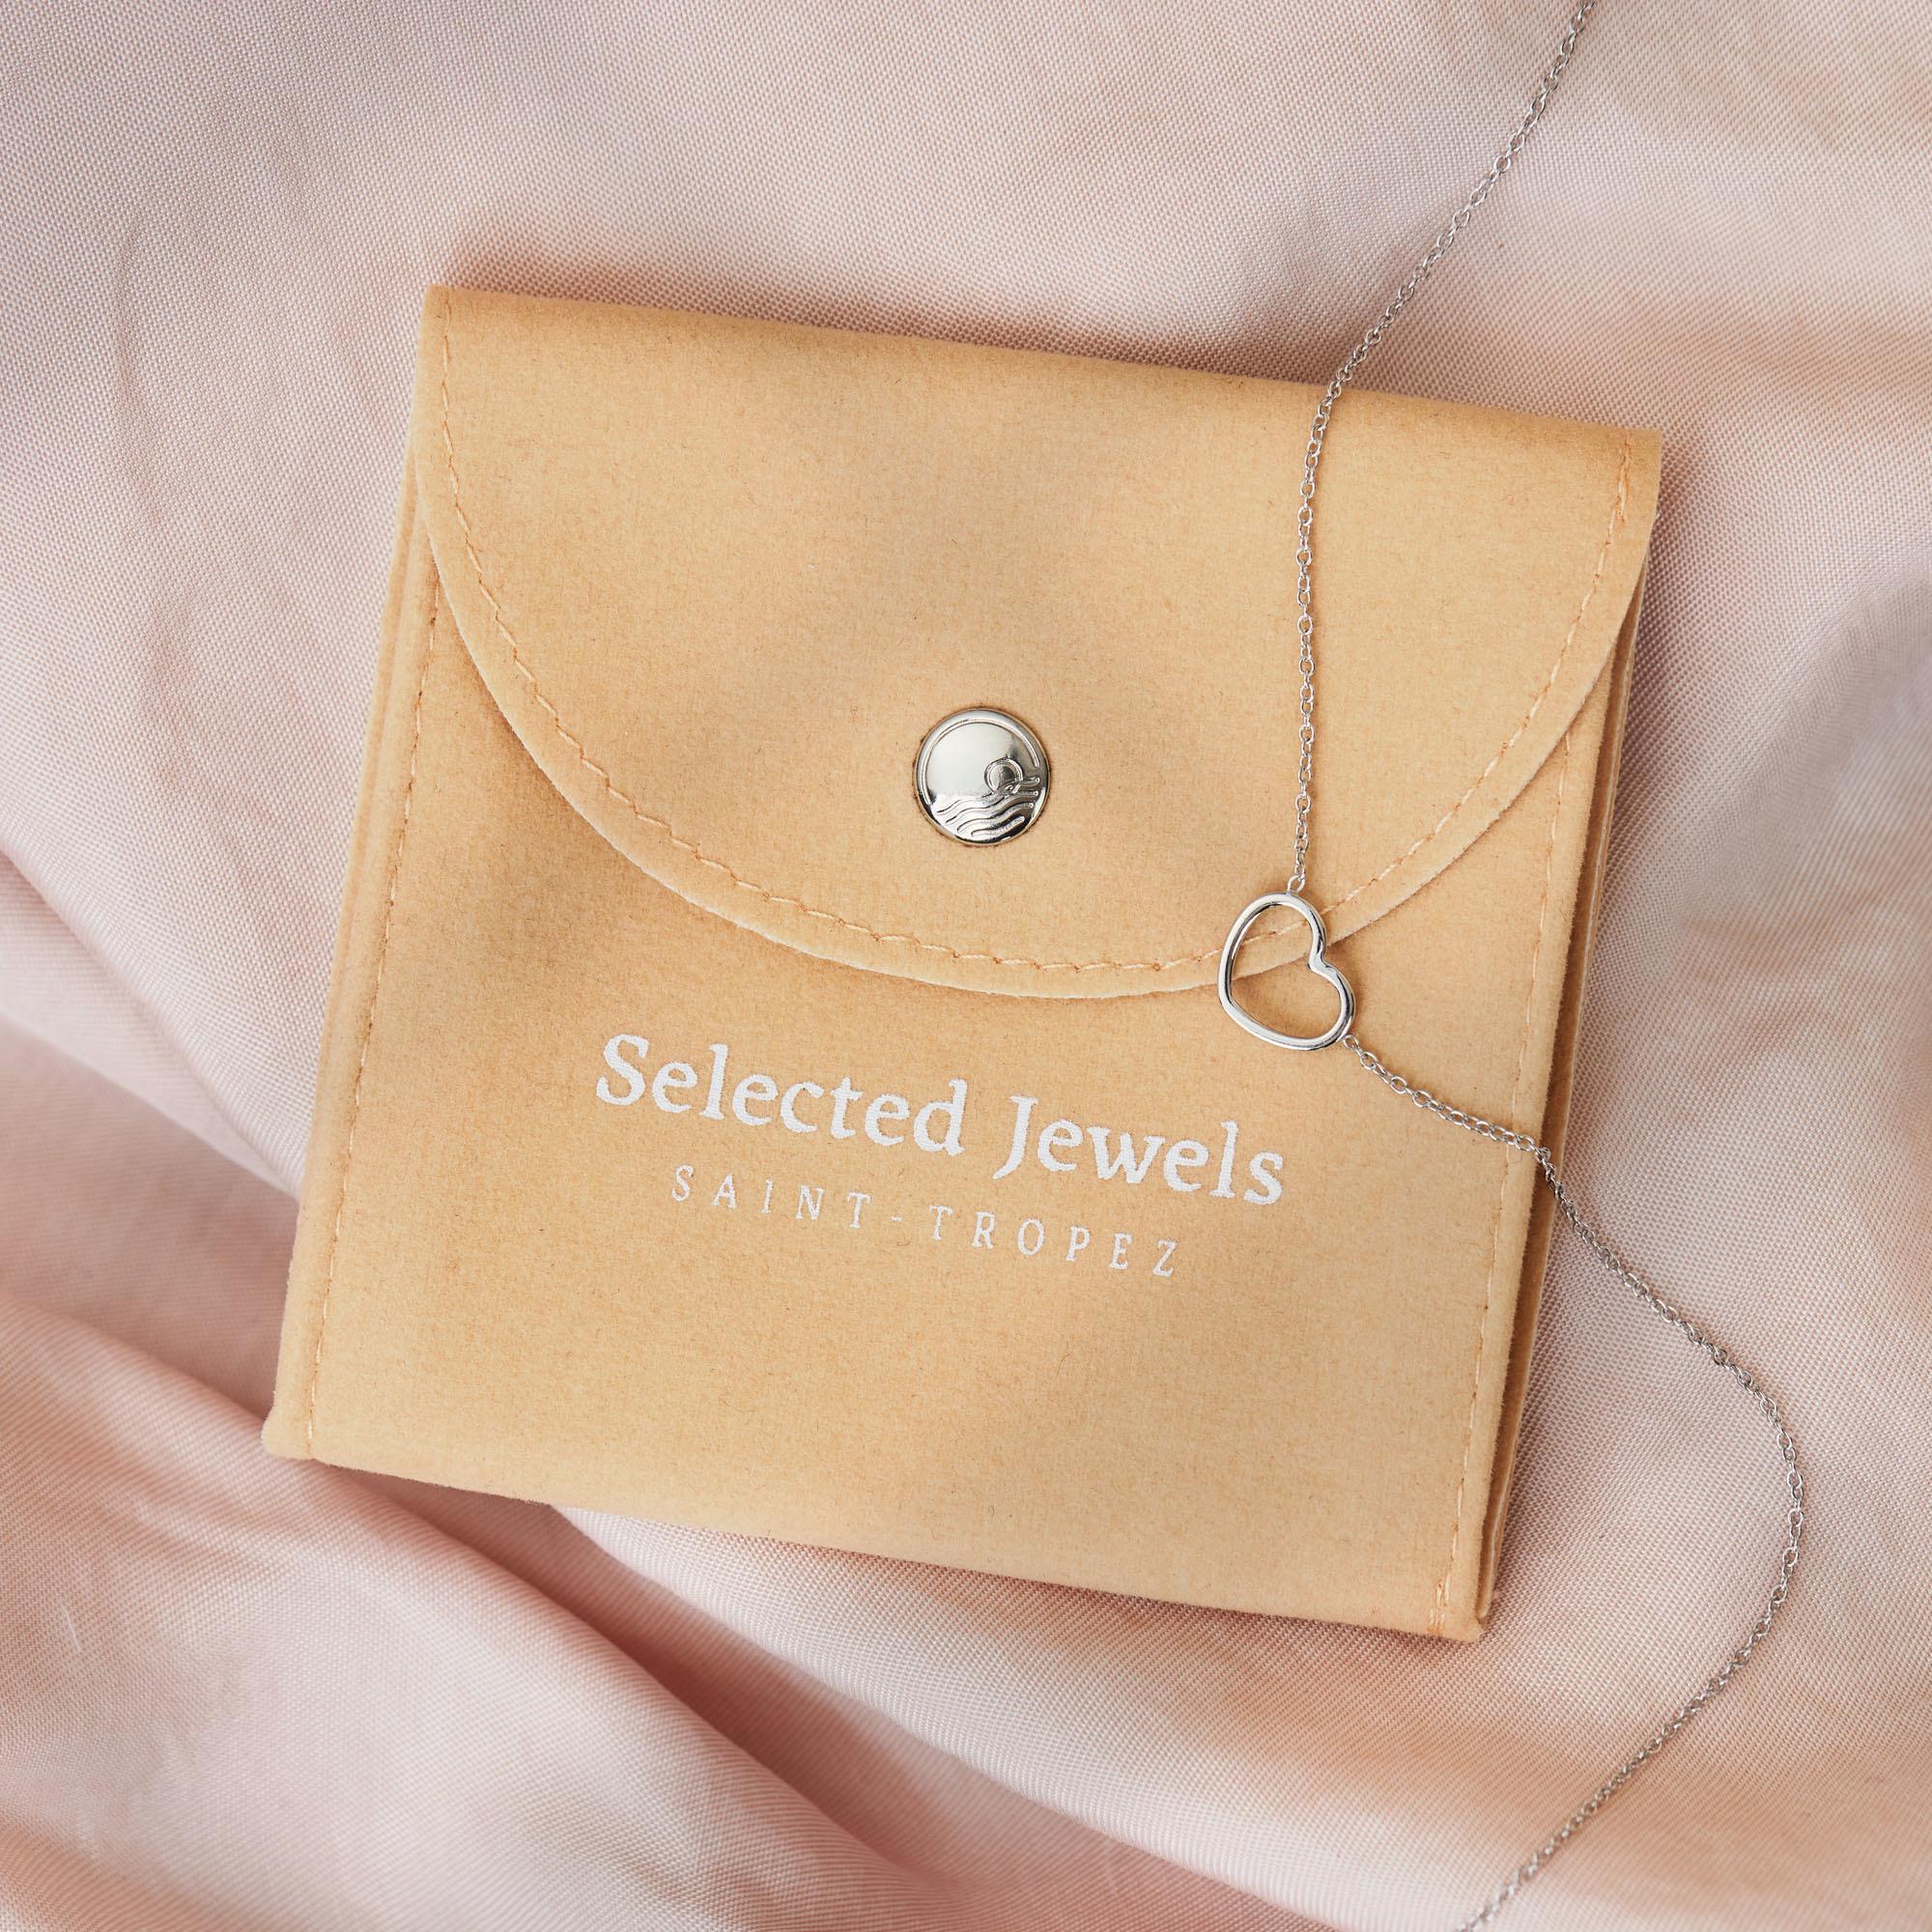 Selected Jewels Julie Lucie creoler i 925 sterling silver